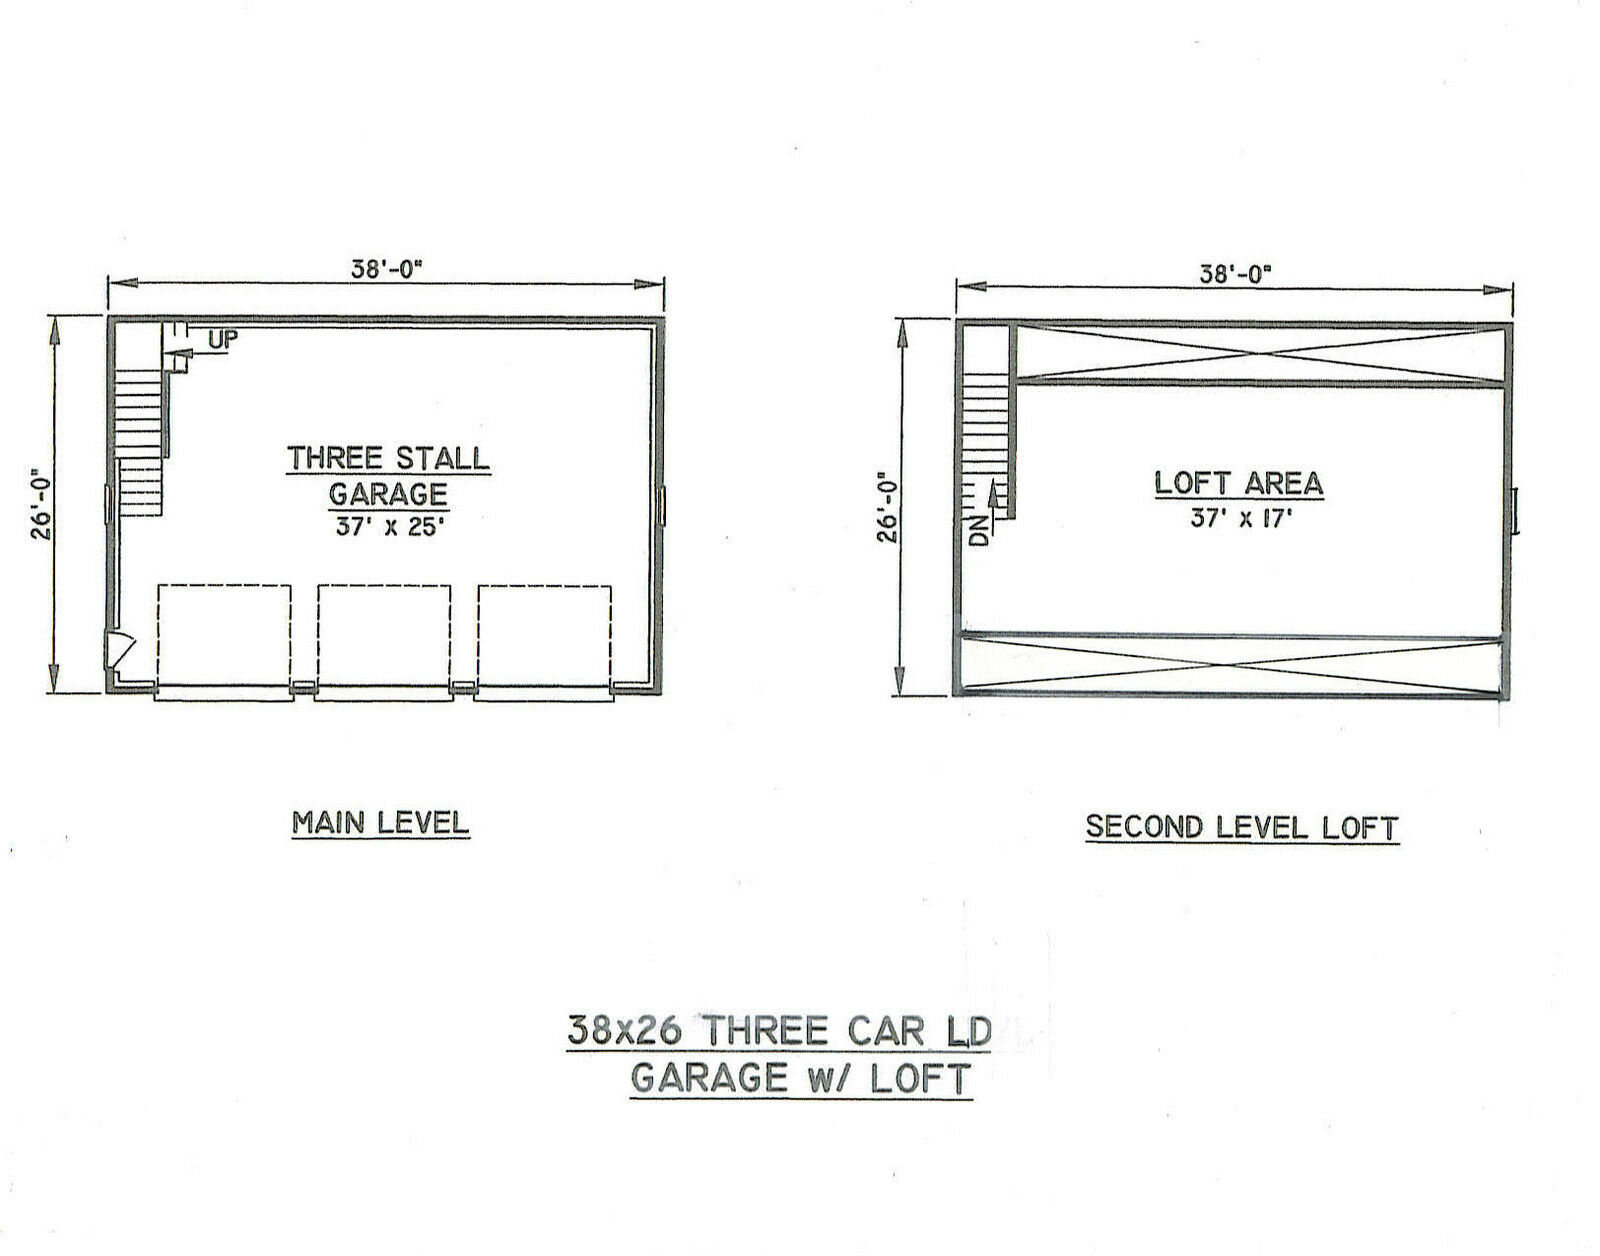 38x26 3 Car Garage Building Blueprint Plans W Wlkuploft